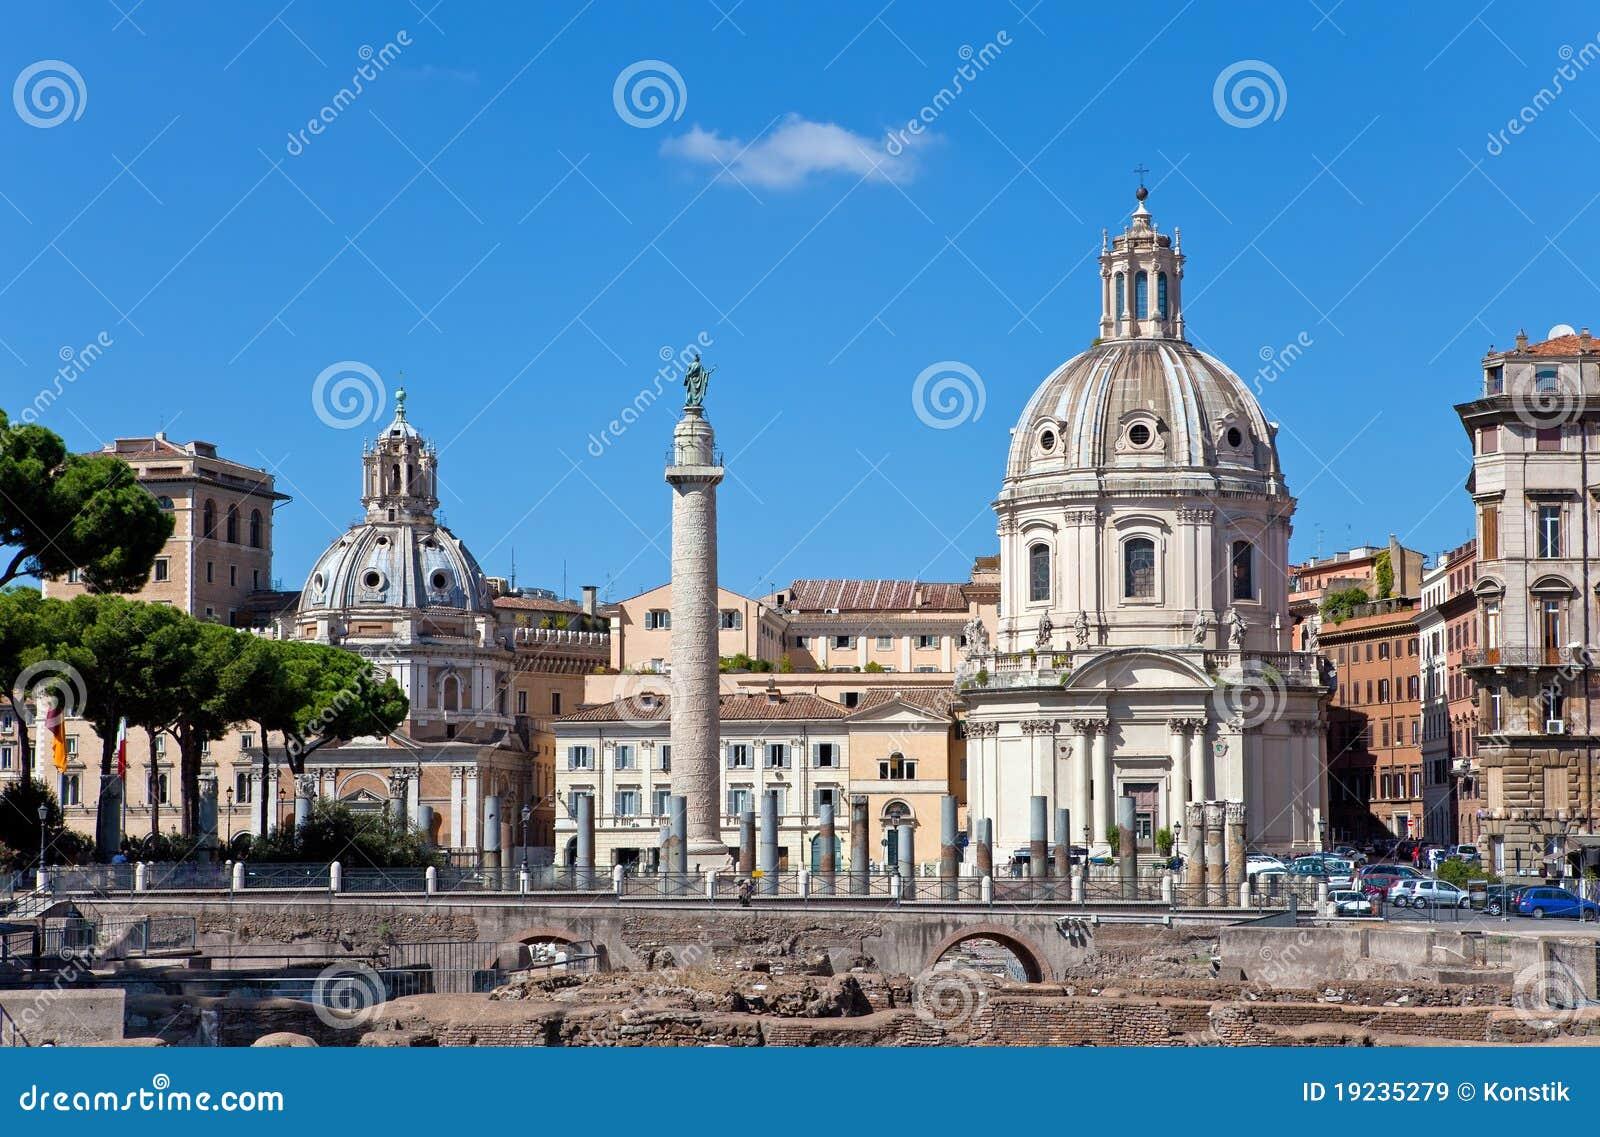 wichtige kirchen in rome - photo#7